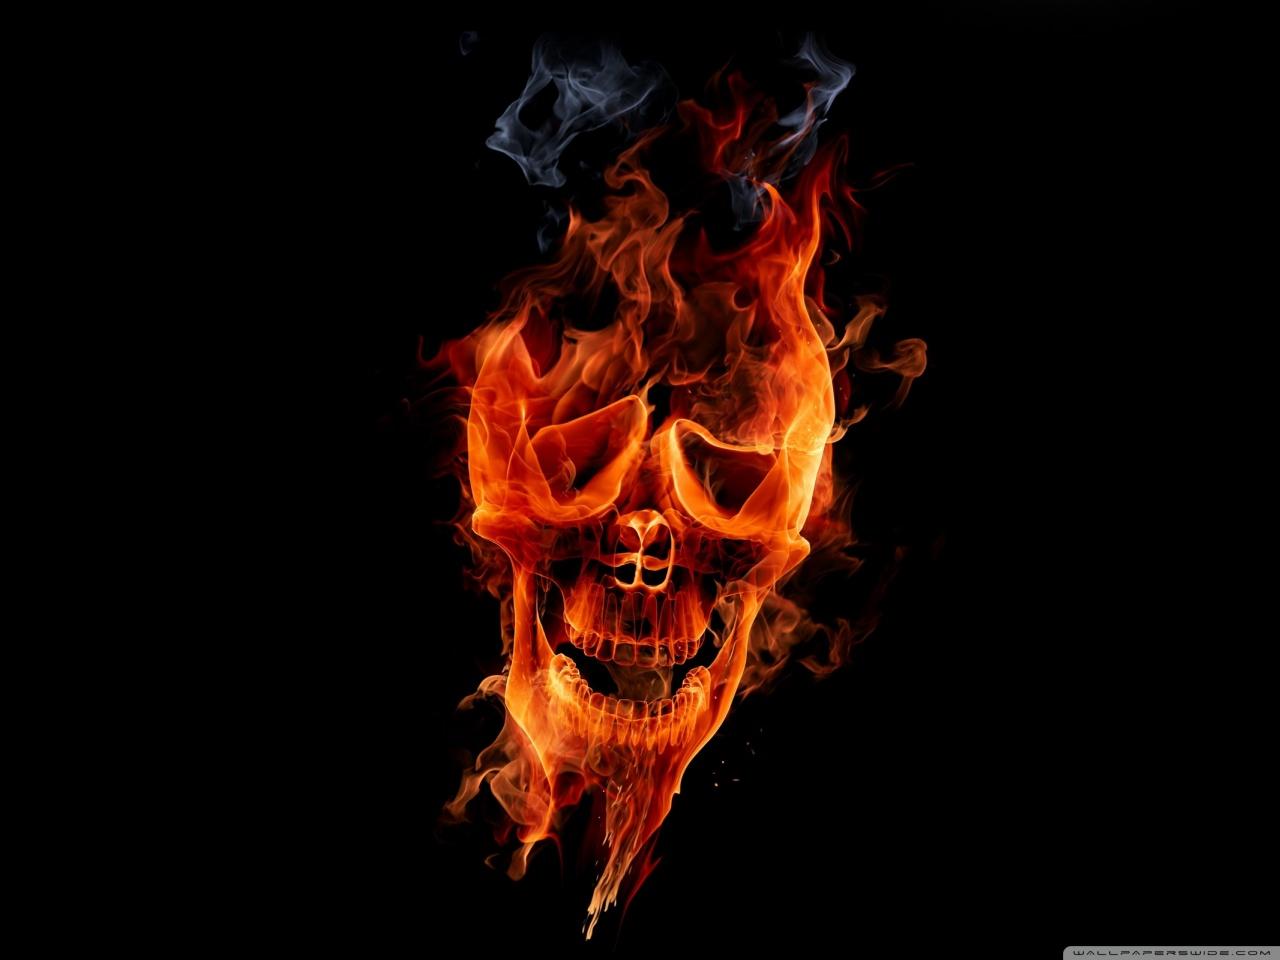 Fire Skull HD desktop wallpaper : High Definition : Fullscreen